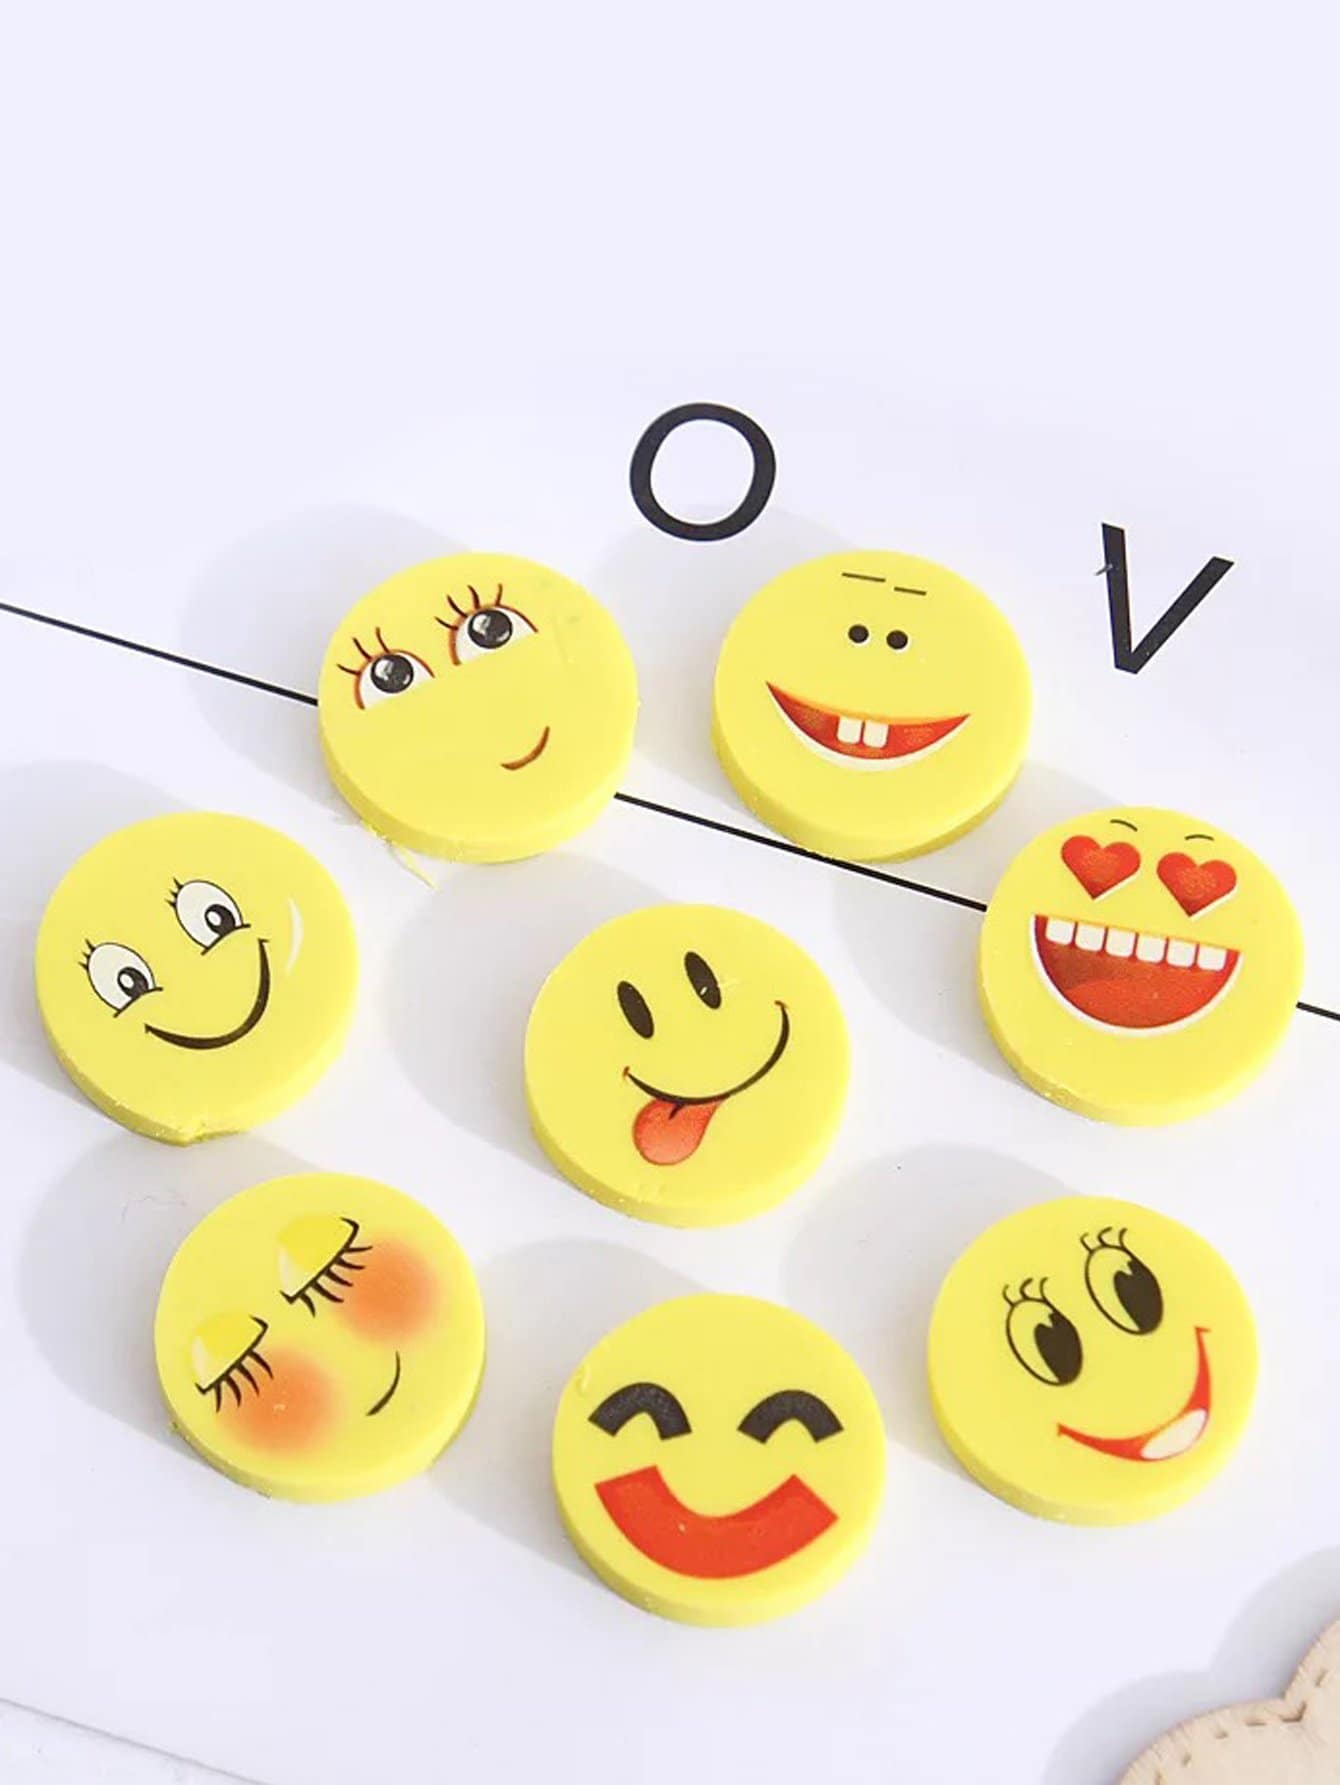 Random Emoji Eraser 4pcs random color eraser 1pc